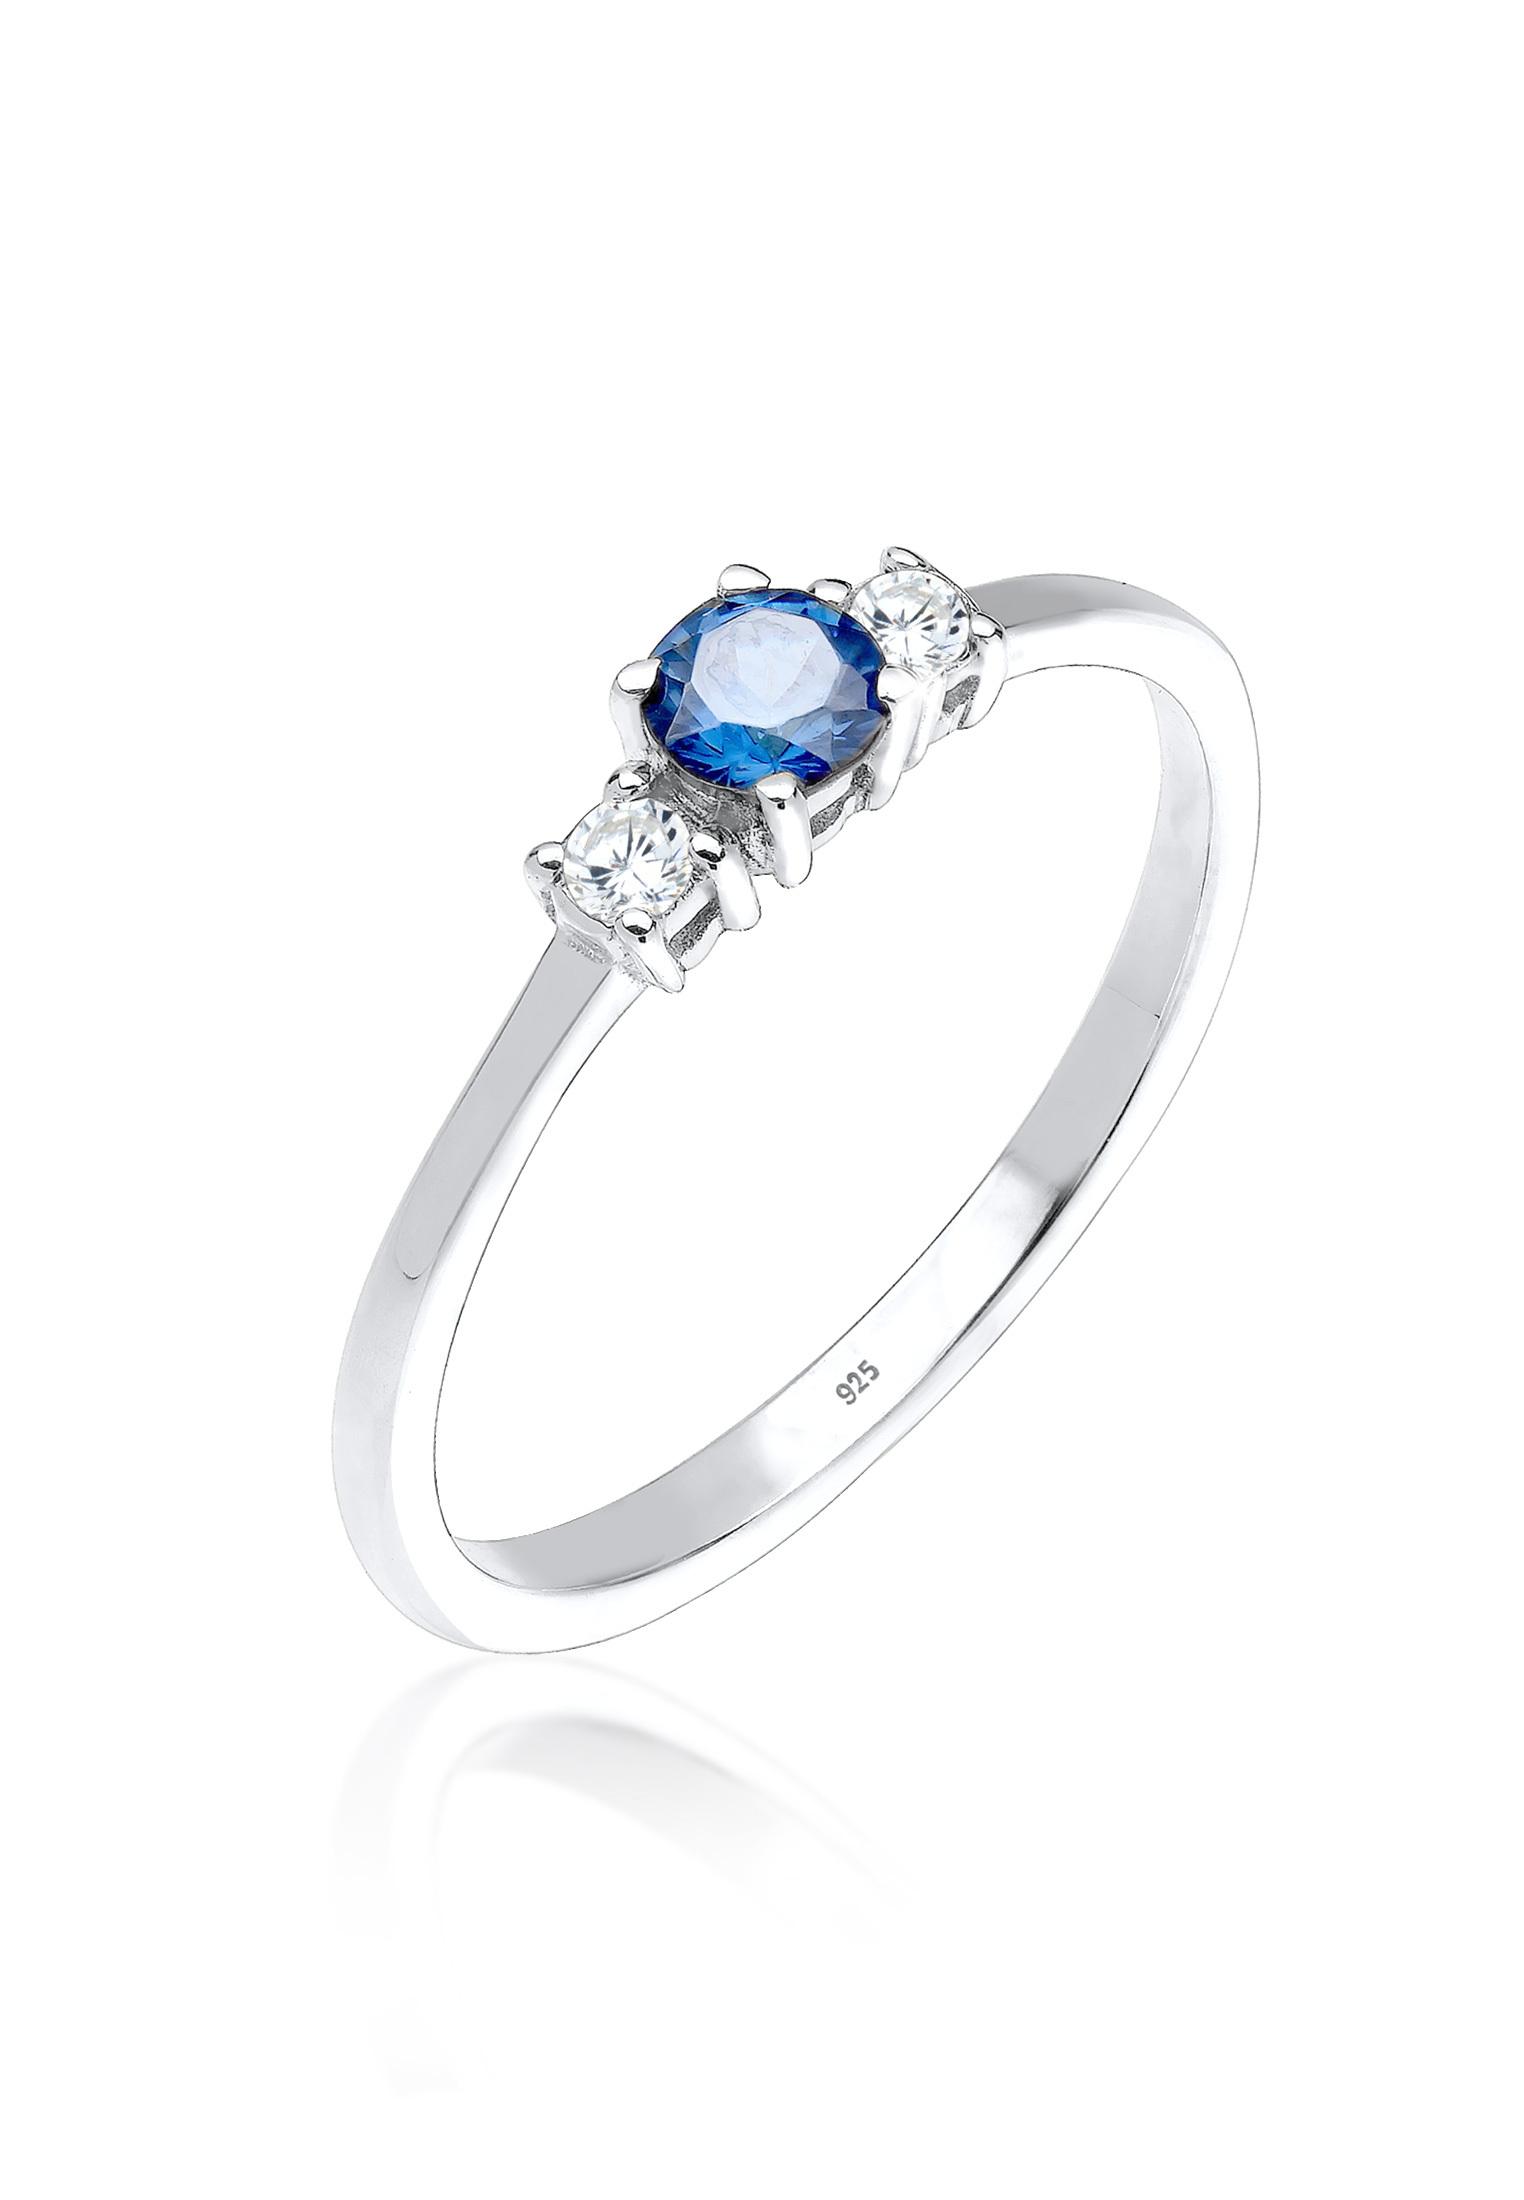 Ring | Saphir ( Blau ) | 925er Sterling Silber